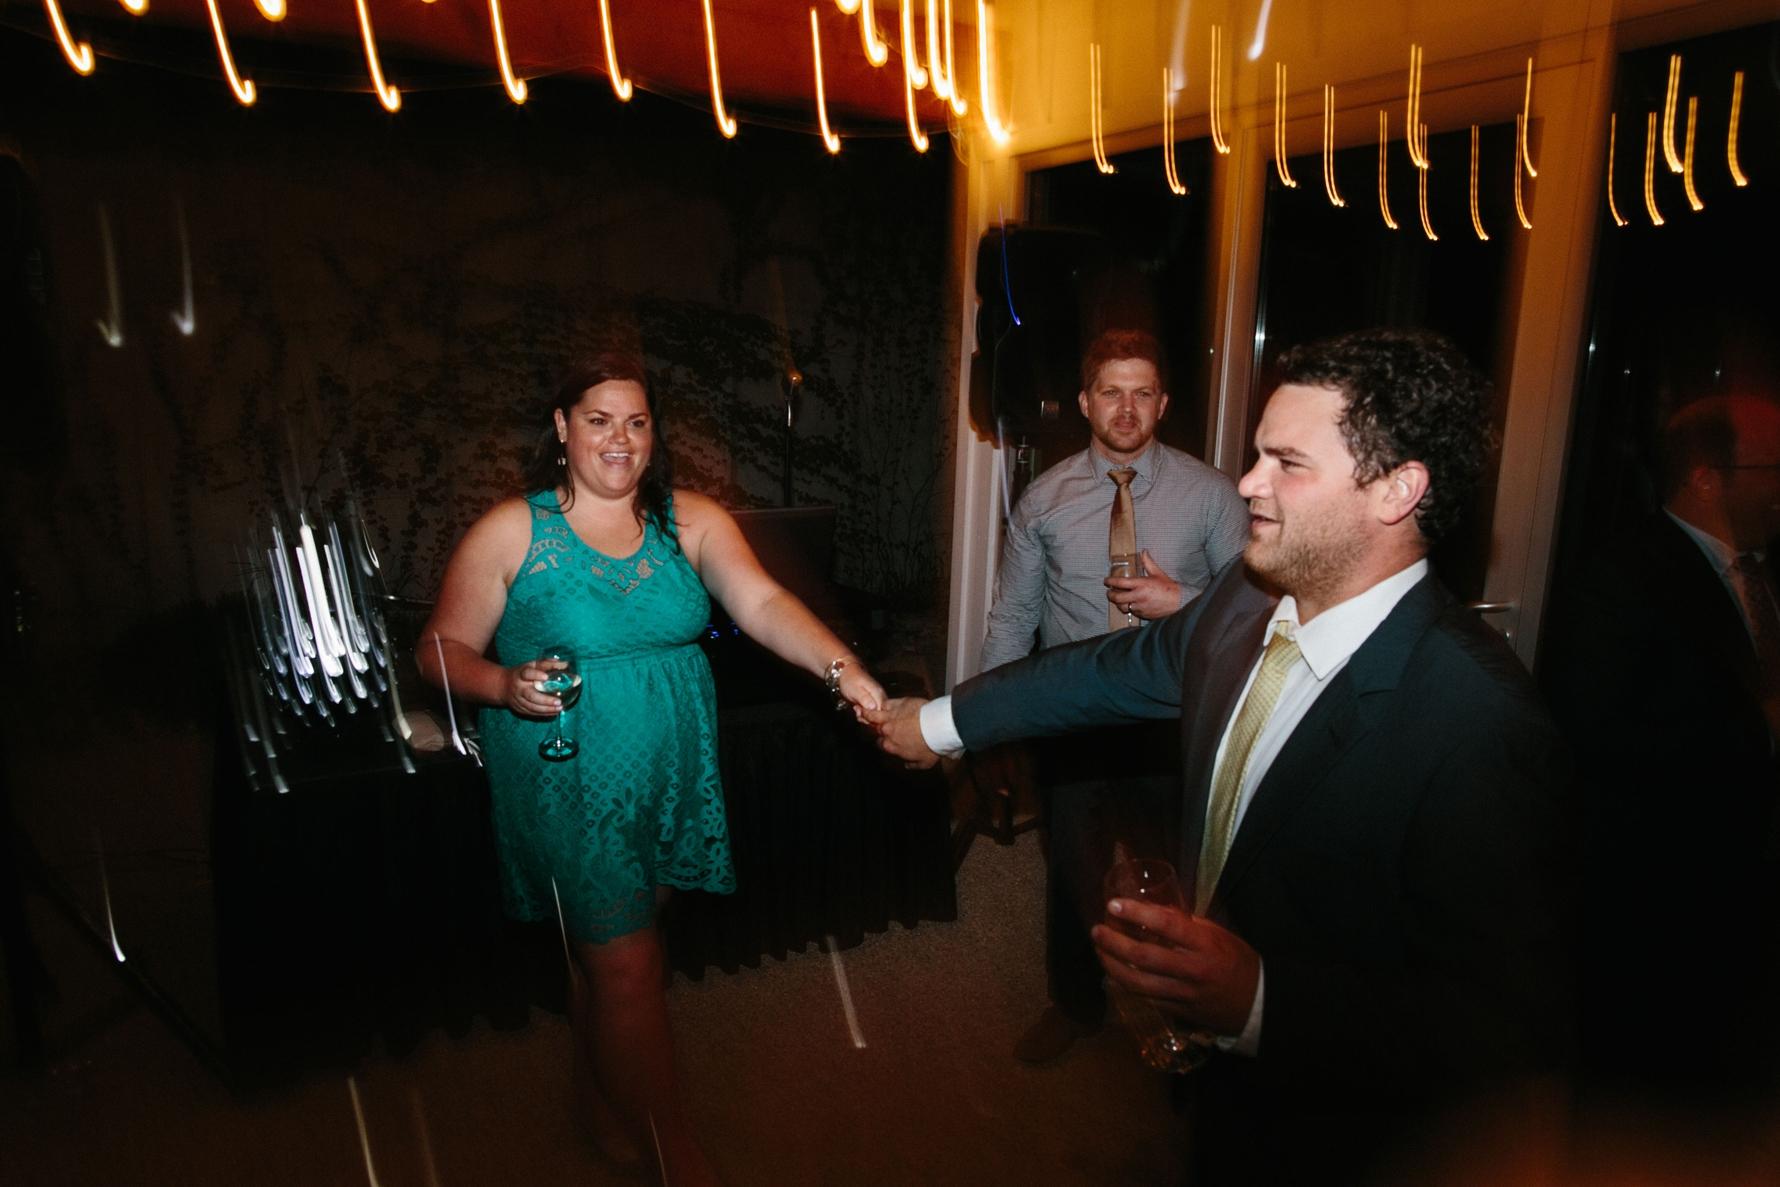 Anderson Wedding 130.JPG